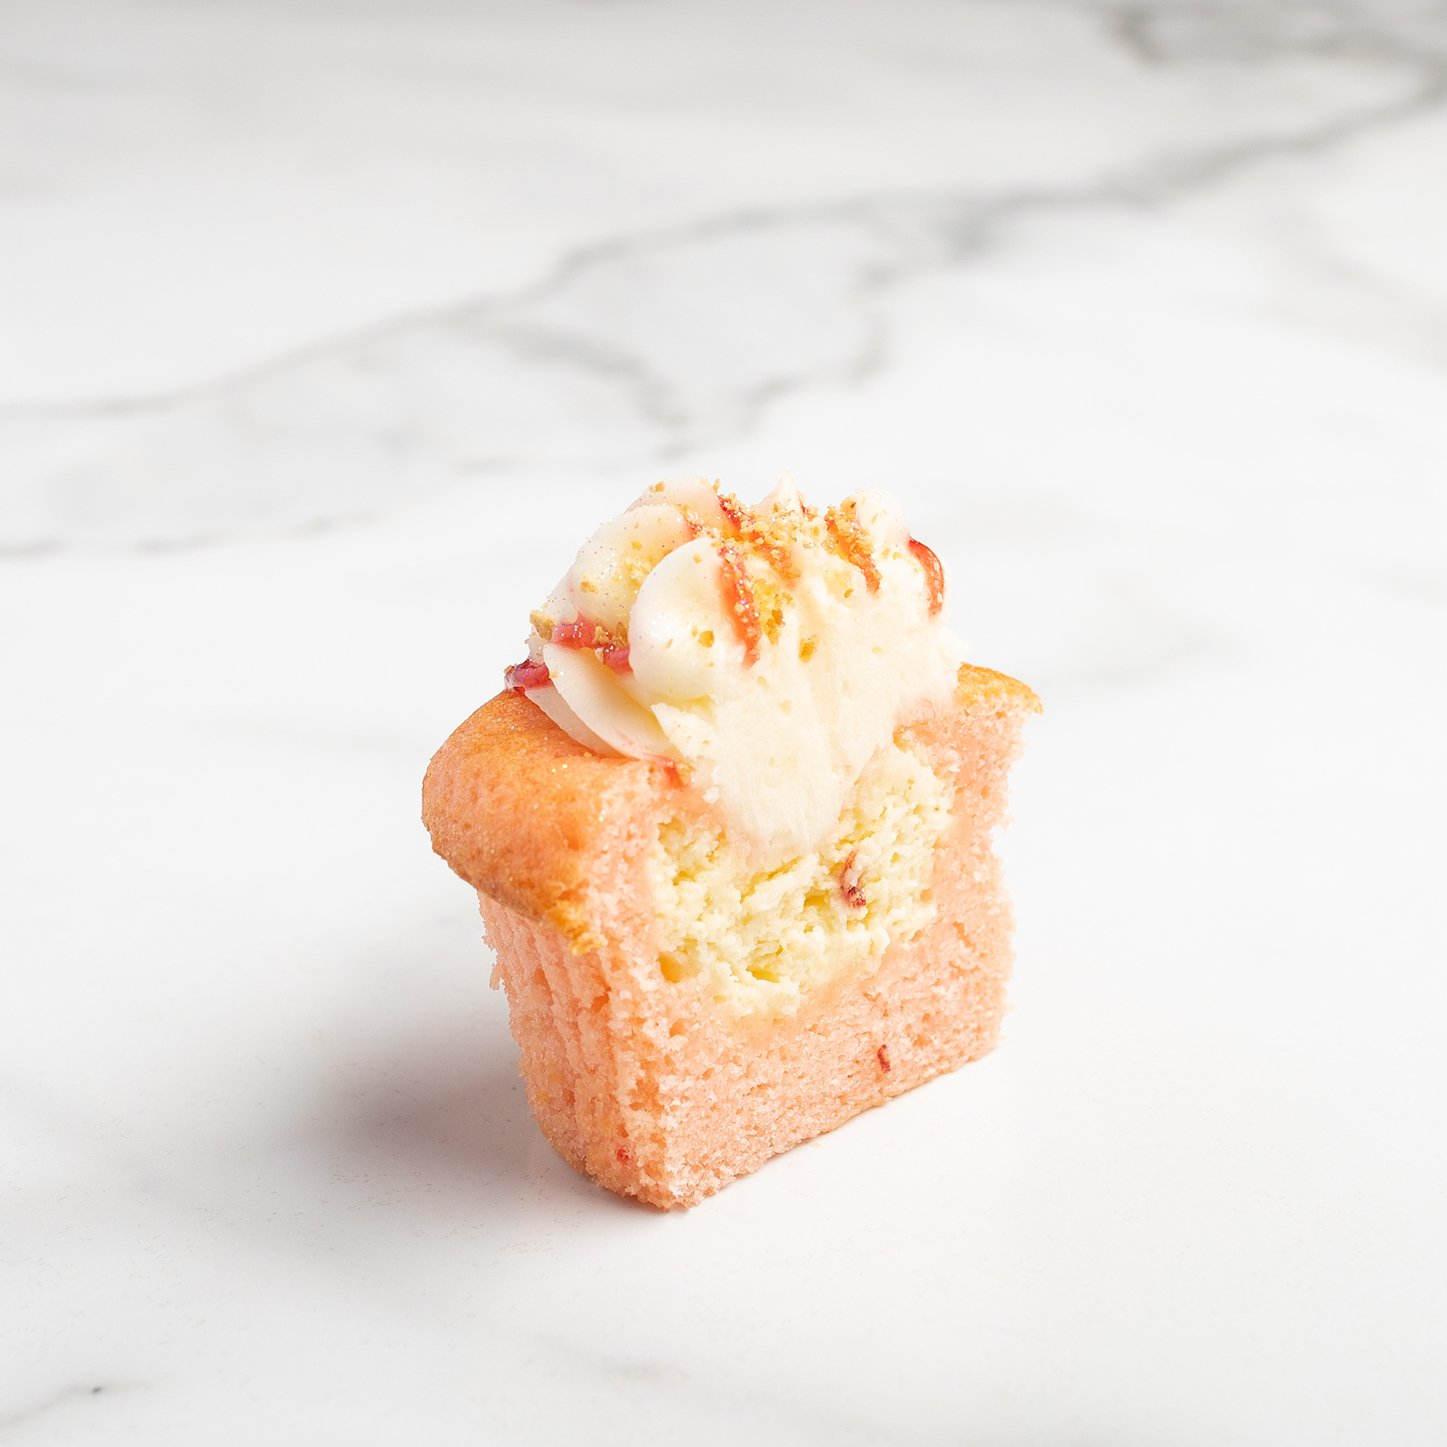 Strawberry Cheesecake - Standard